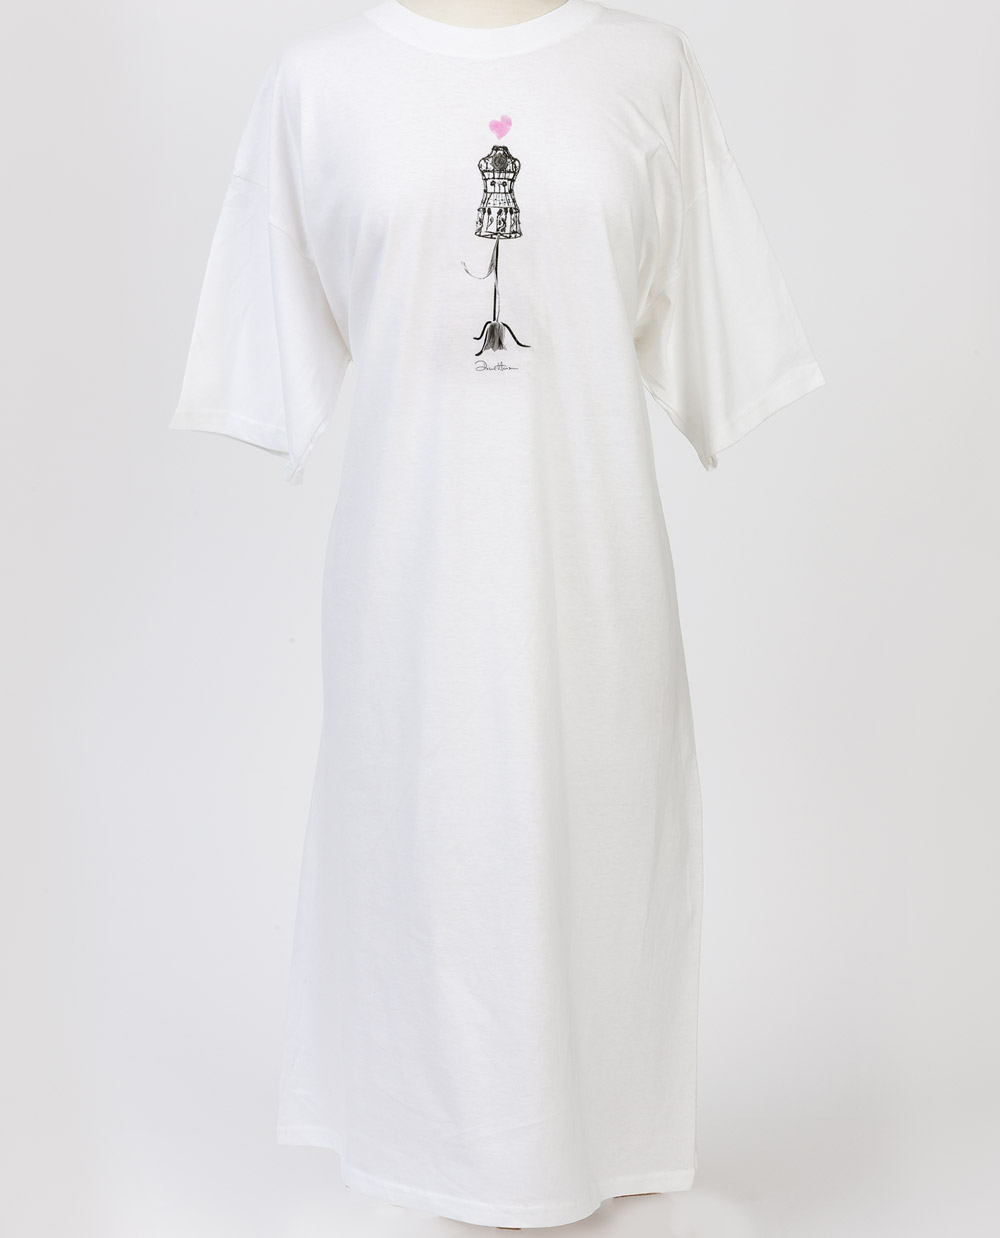 Night shirt - Sewing Love Design